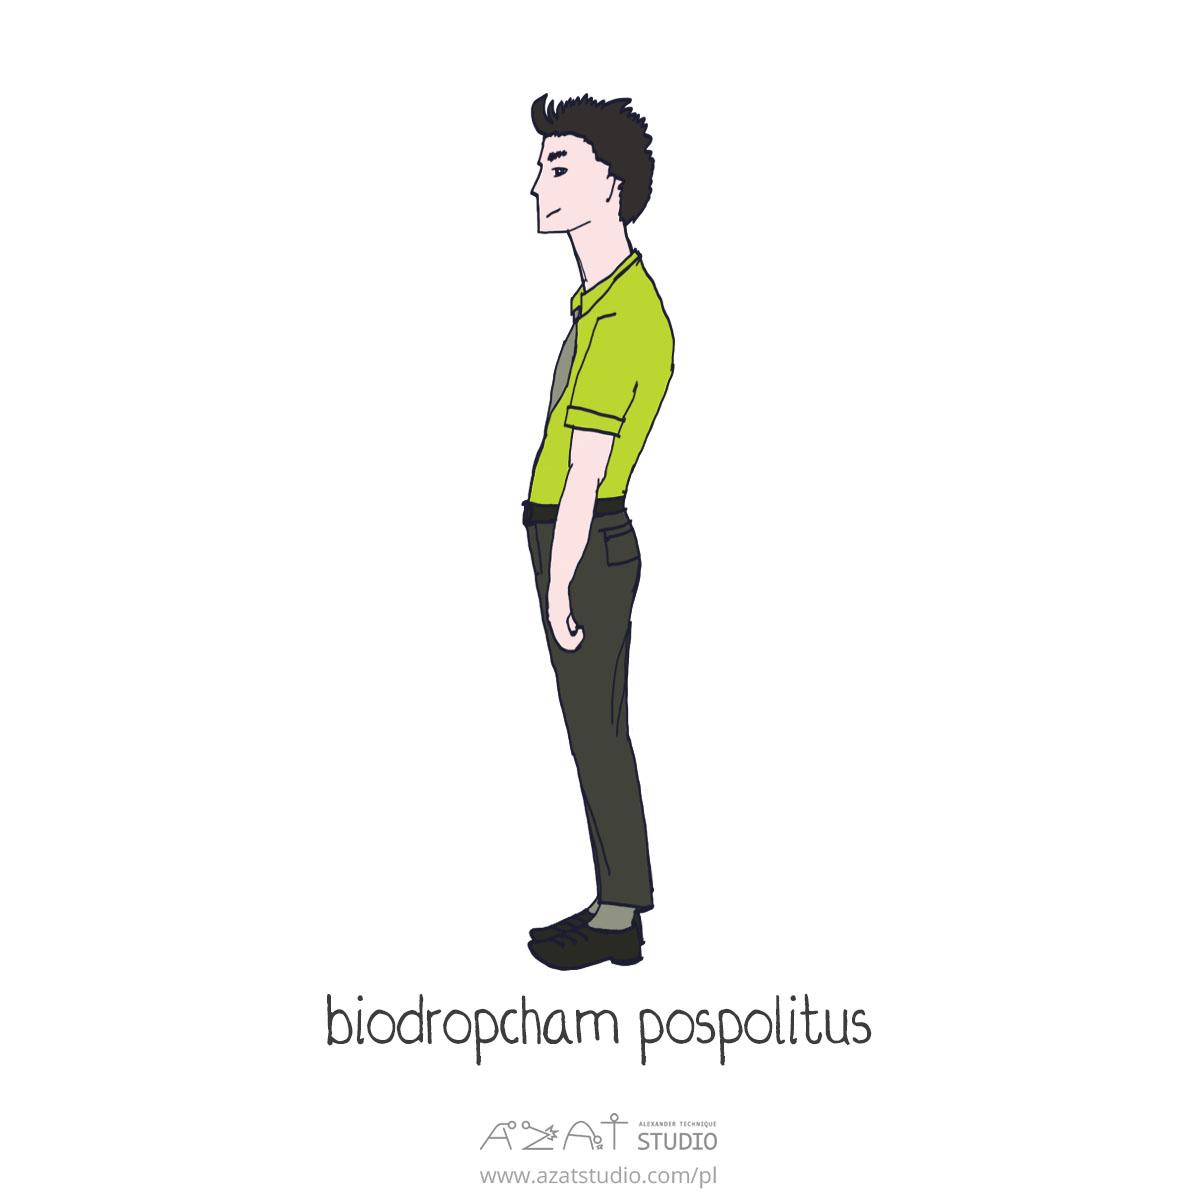 biodropcham pospolitus